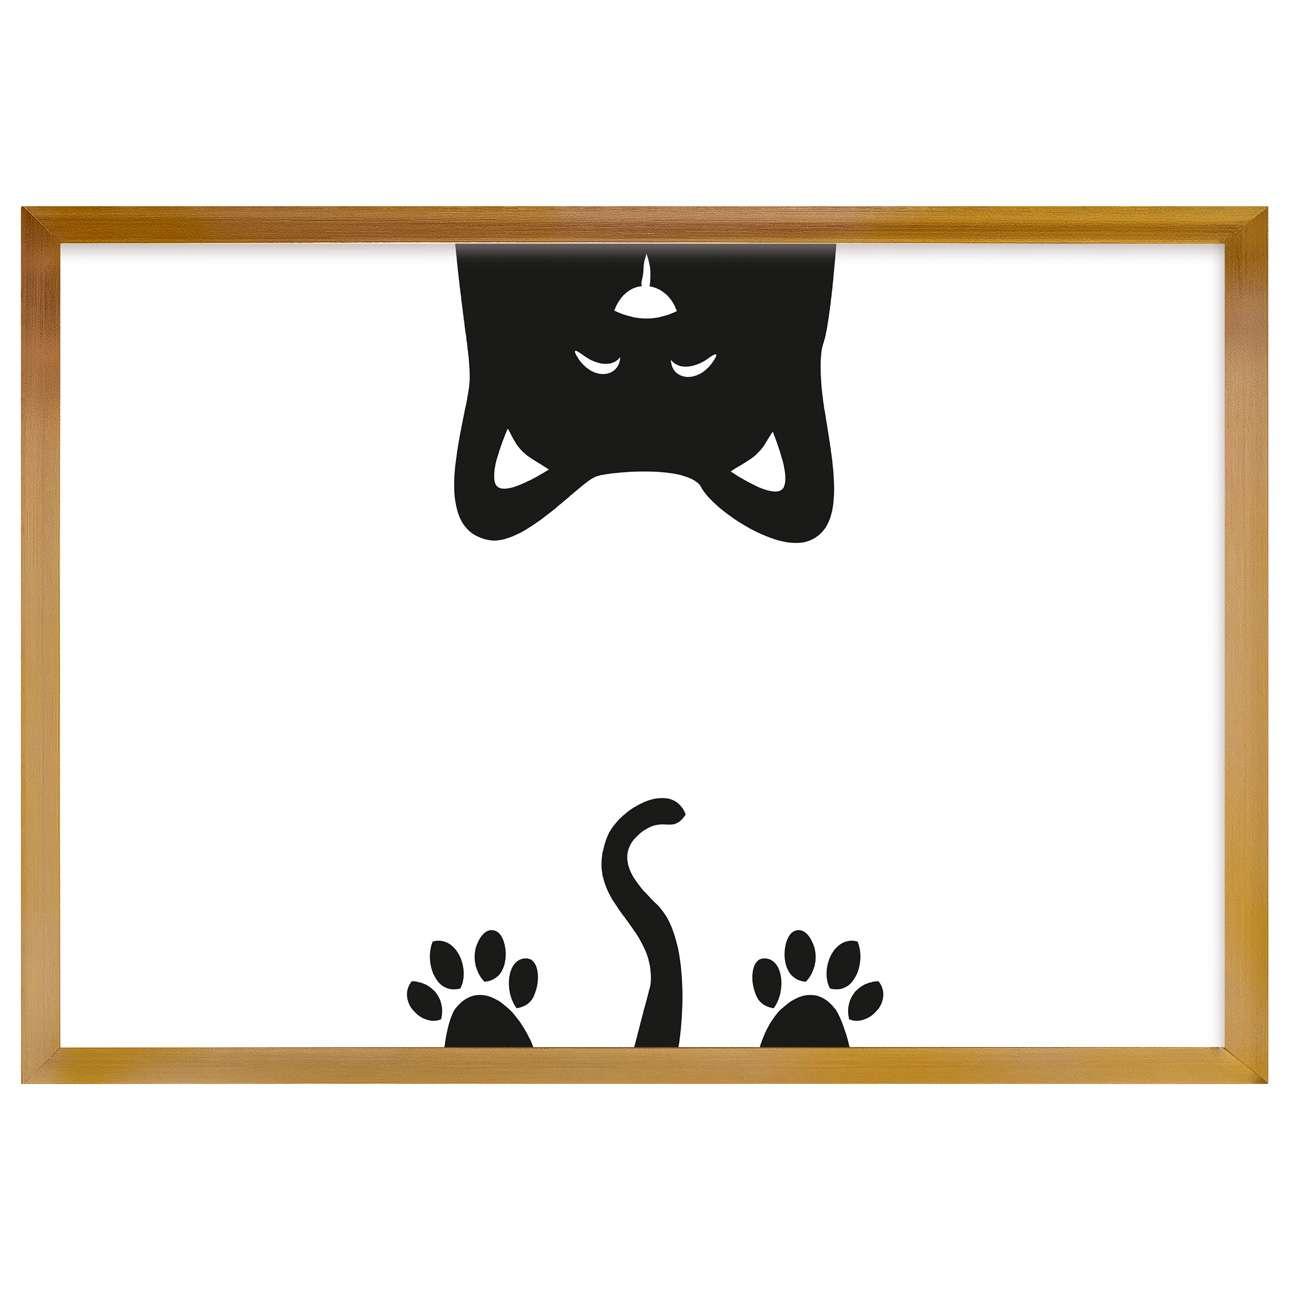 Bild Funny Band cat 21x30cm